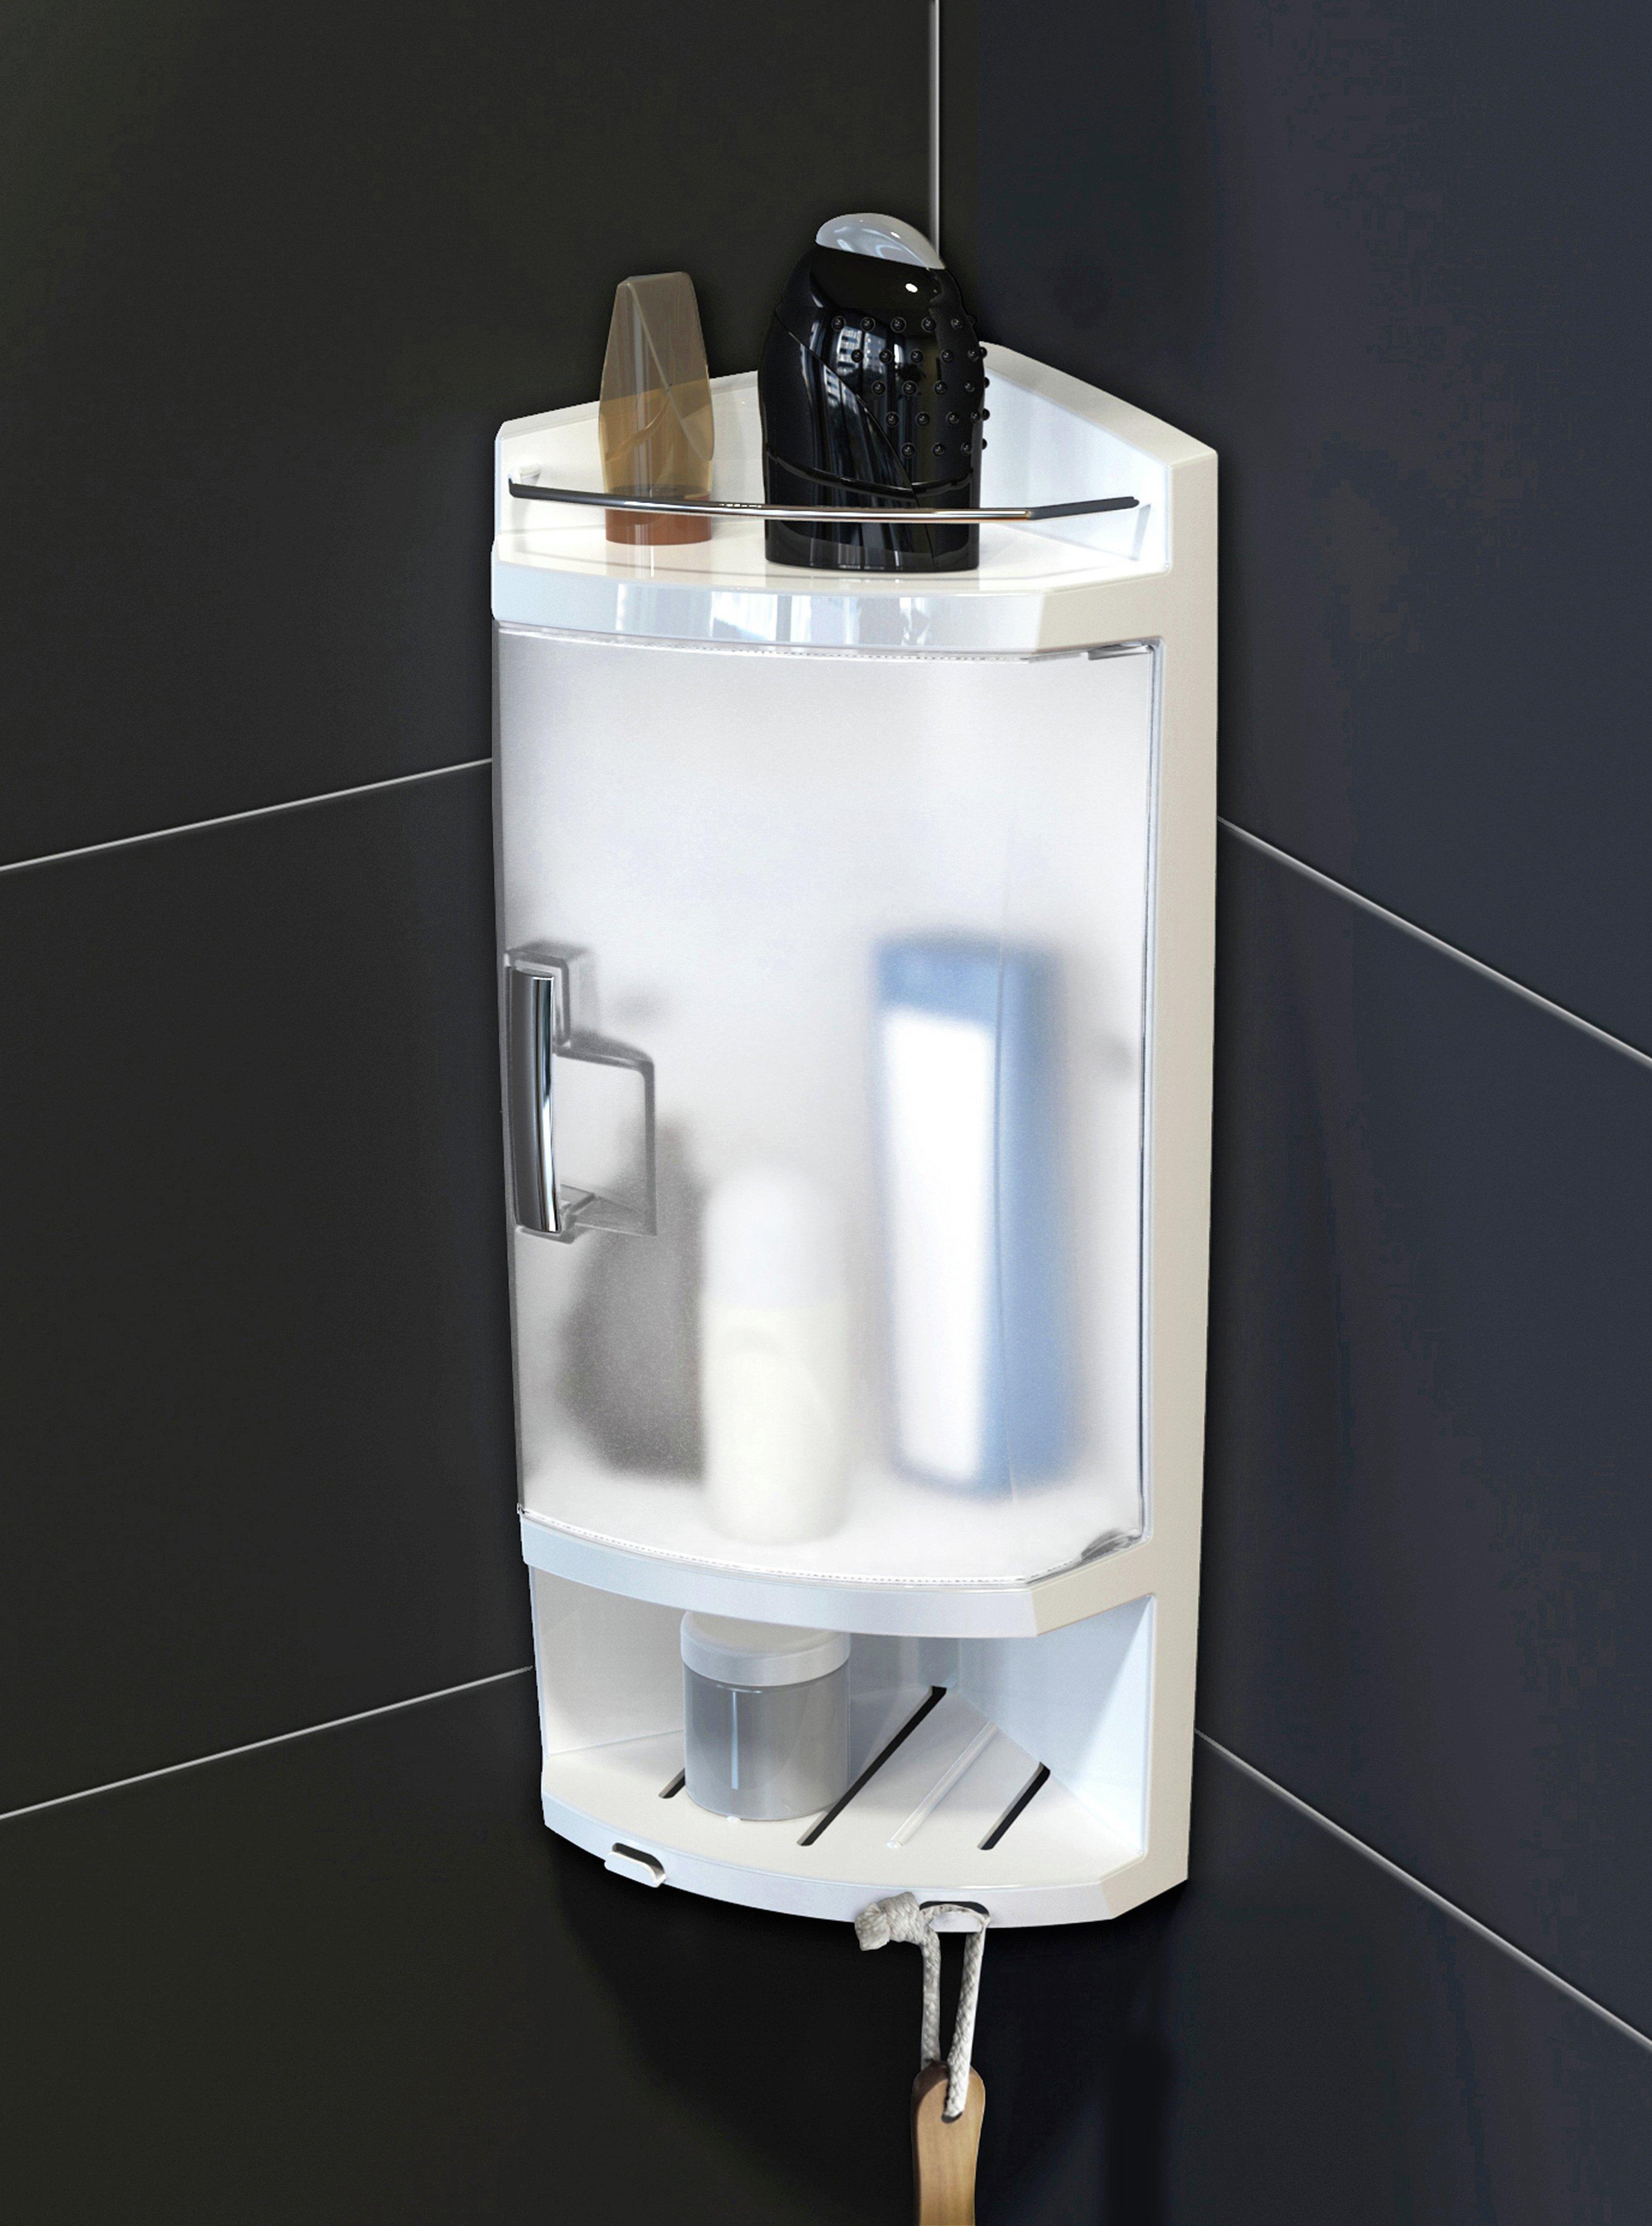 Argos Home Frosted Door Corner Bathroom Cabinet - White was £24 Now £12 @ Argos